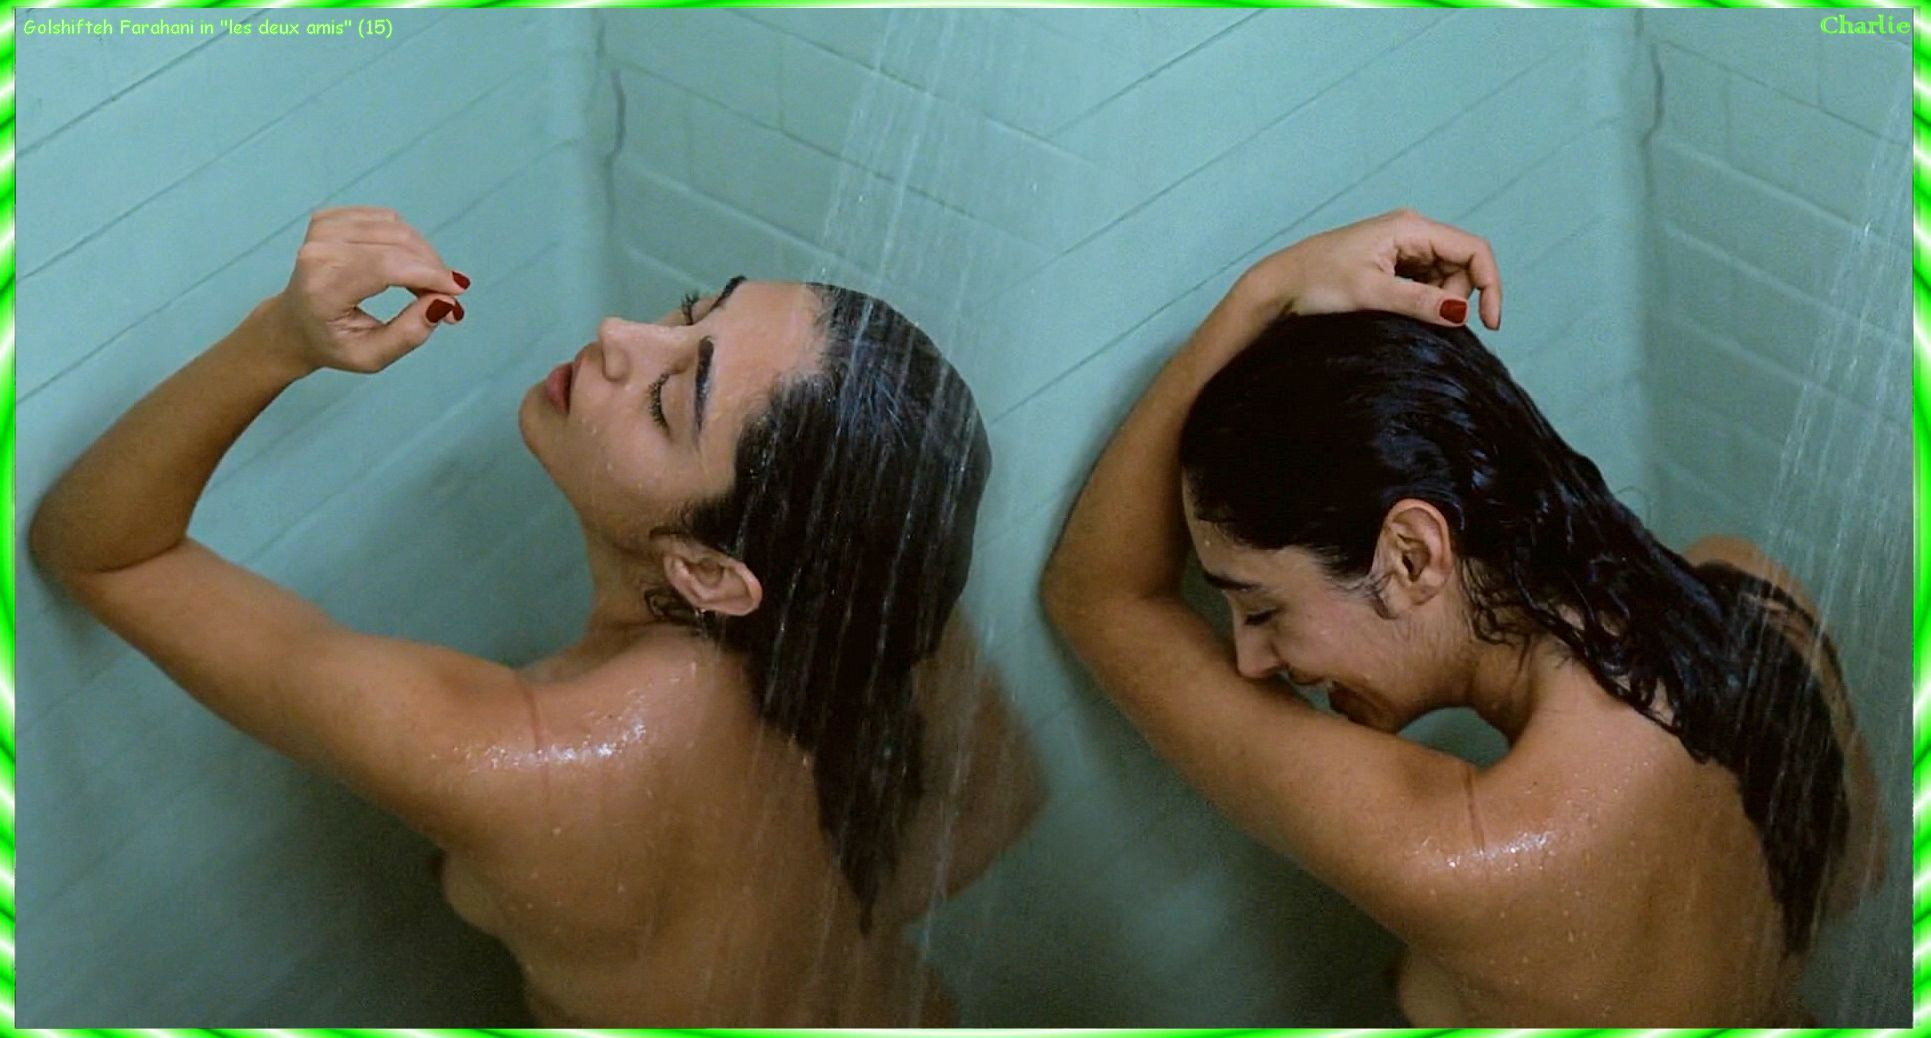 Golshifteh-Farahani-Nude-1